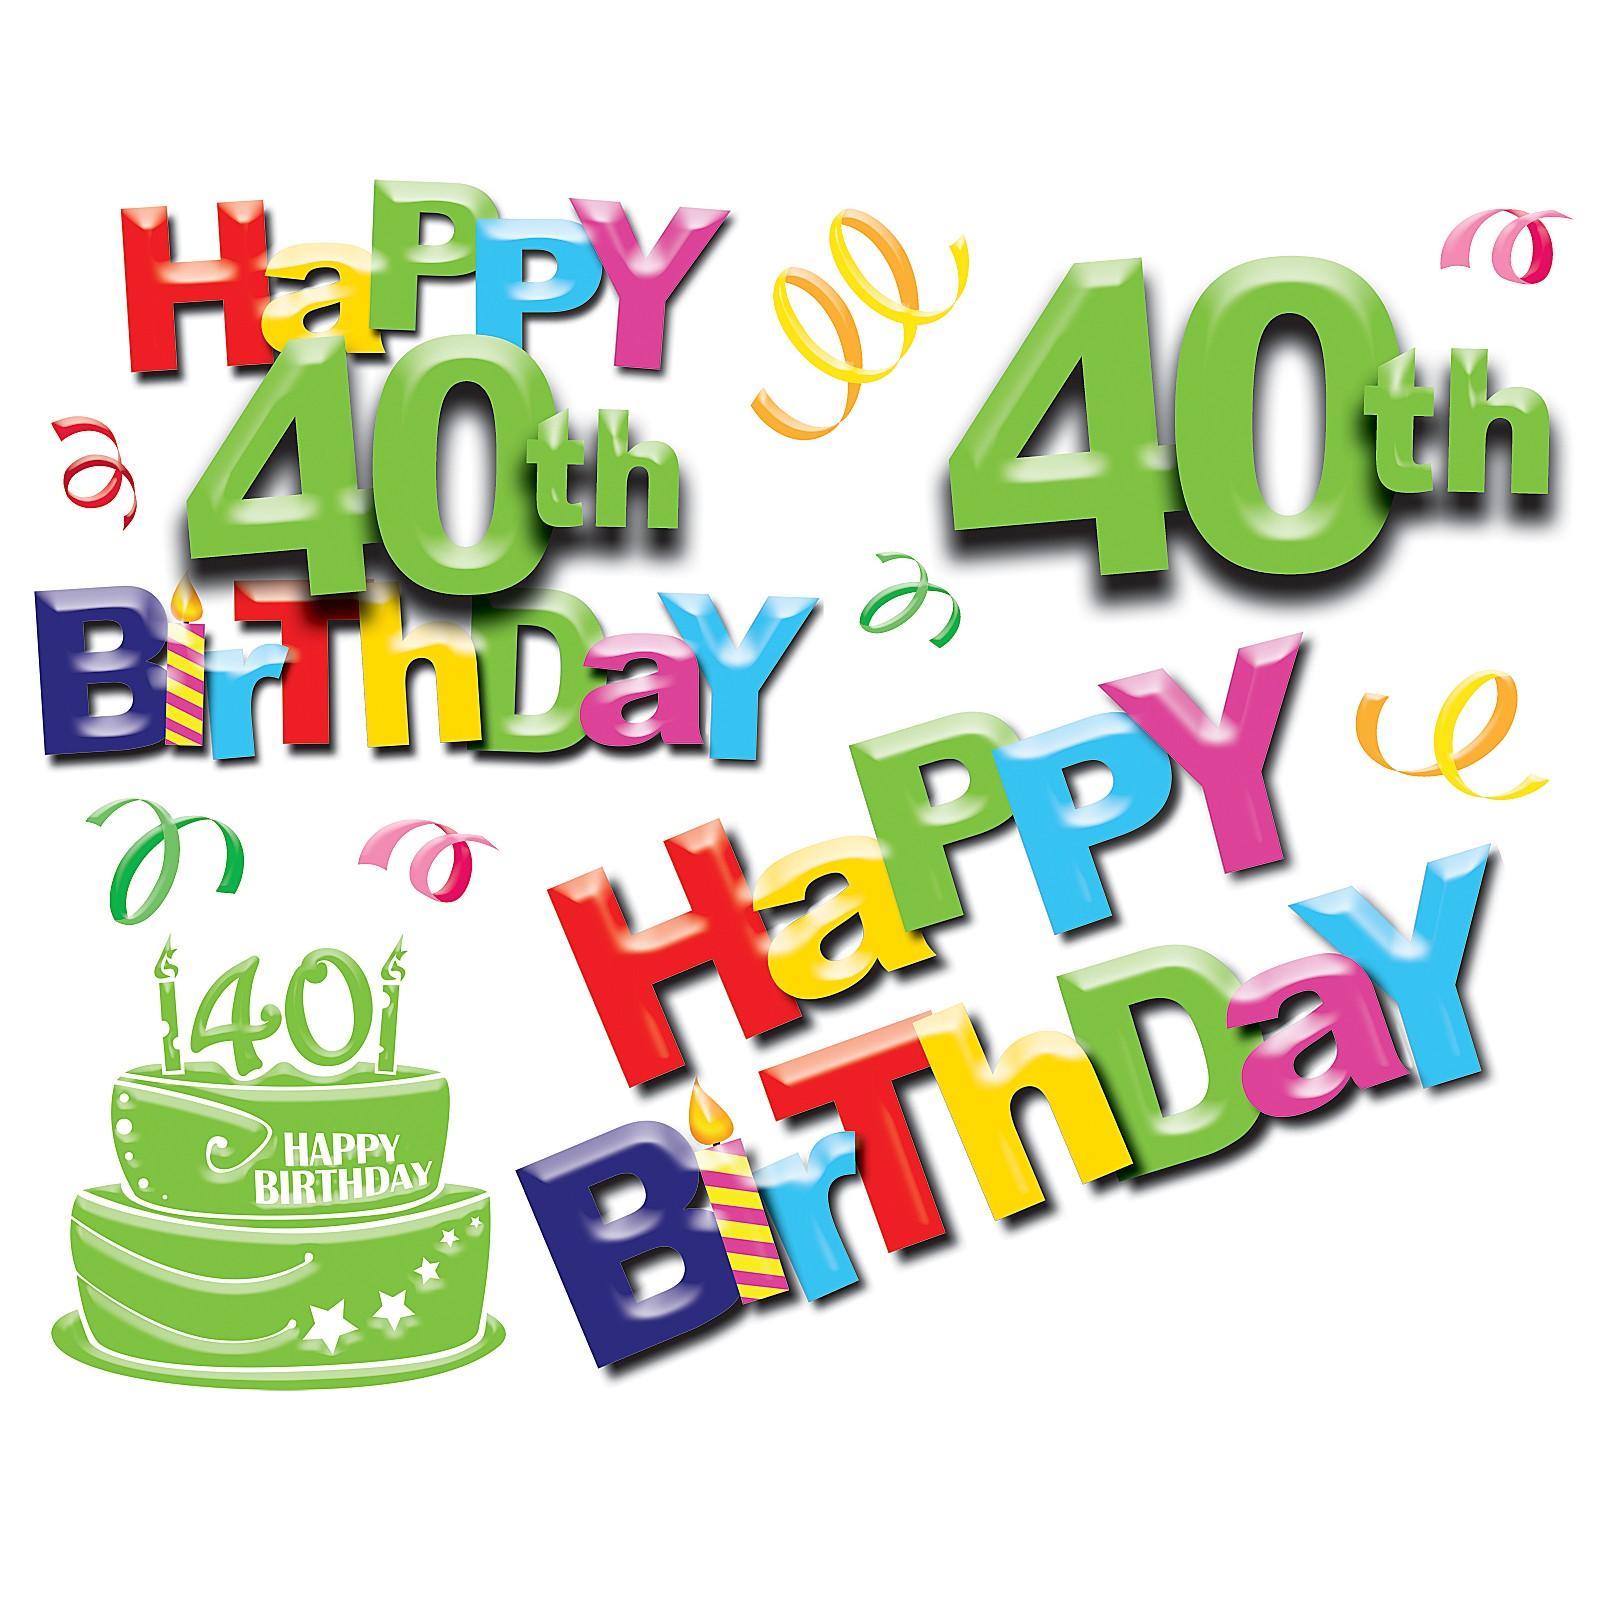 1600x1600 Happy 40th Birthday 1 Just Other Stuff Birthday